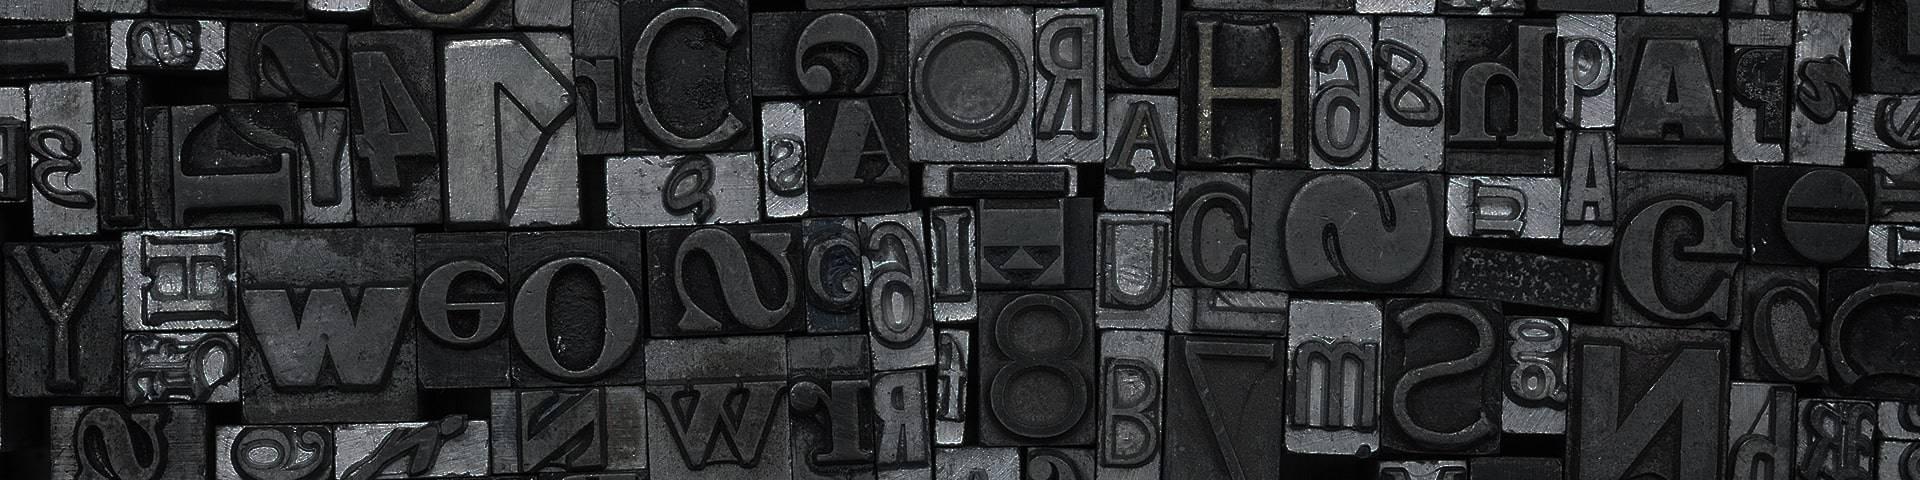 Make Fantastic Instagram Fonts Using Generators